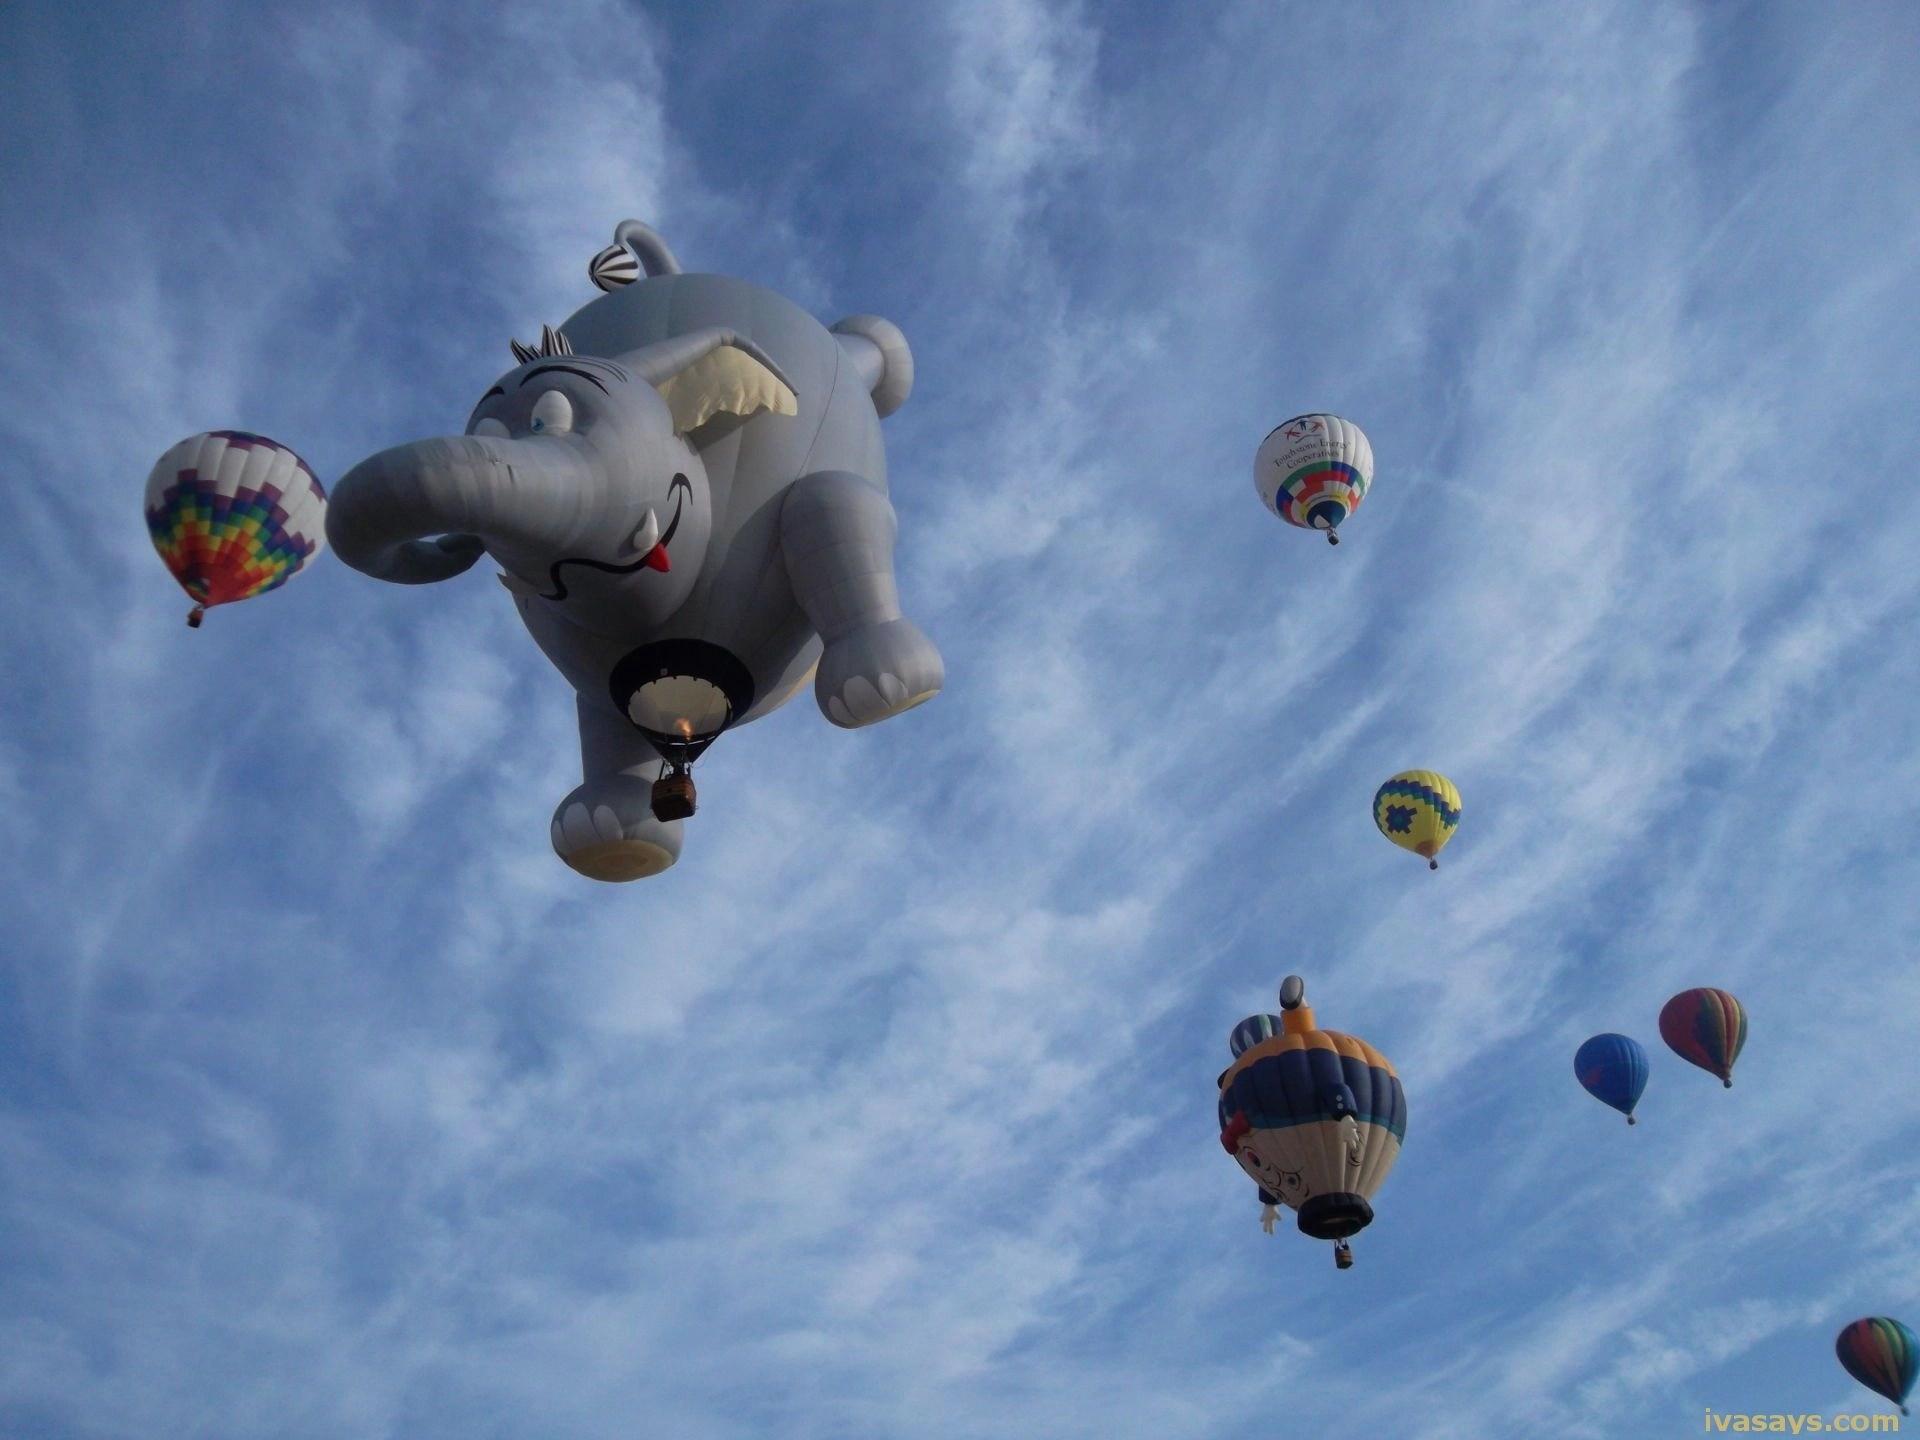 Elephant Hot Air Balloon